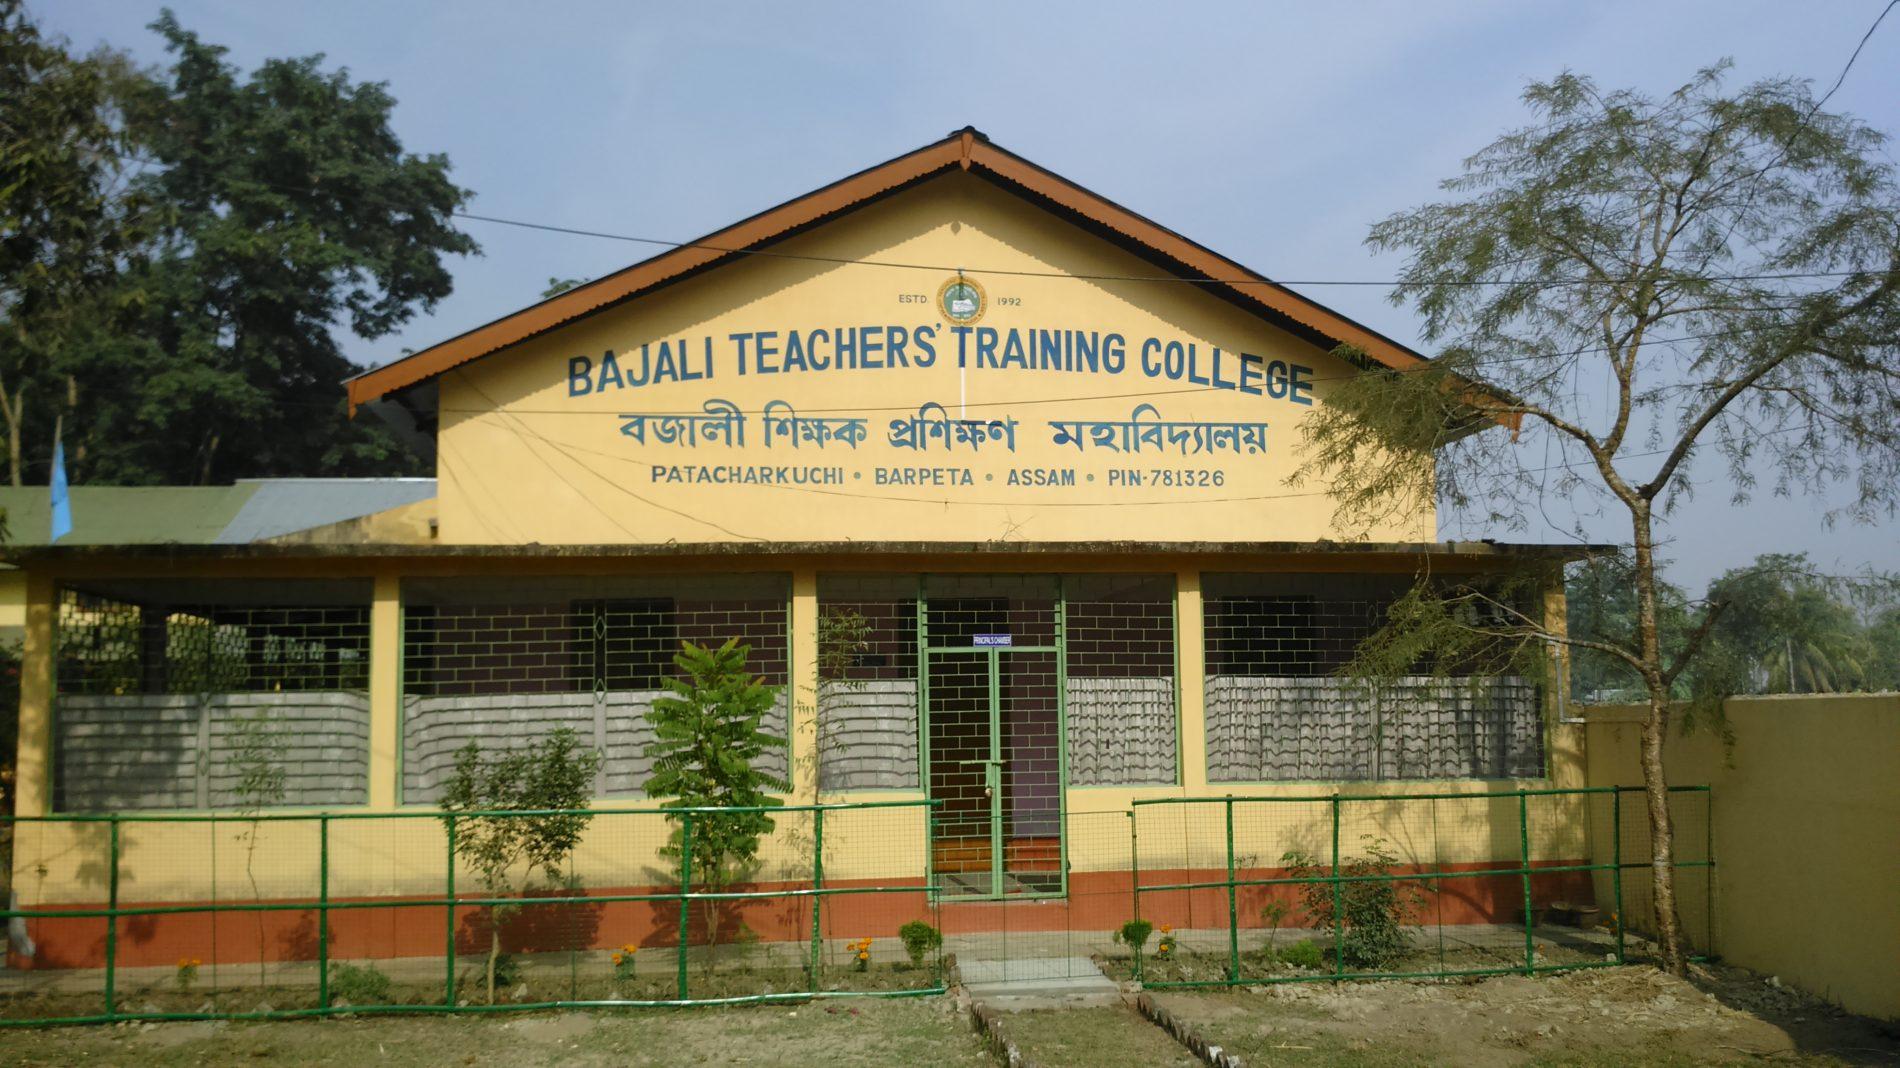 Bajali Teachers' Training College